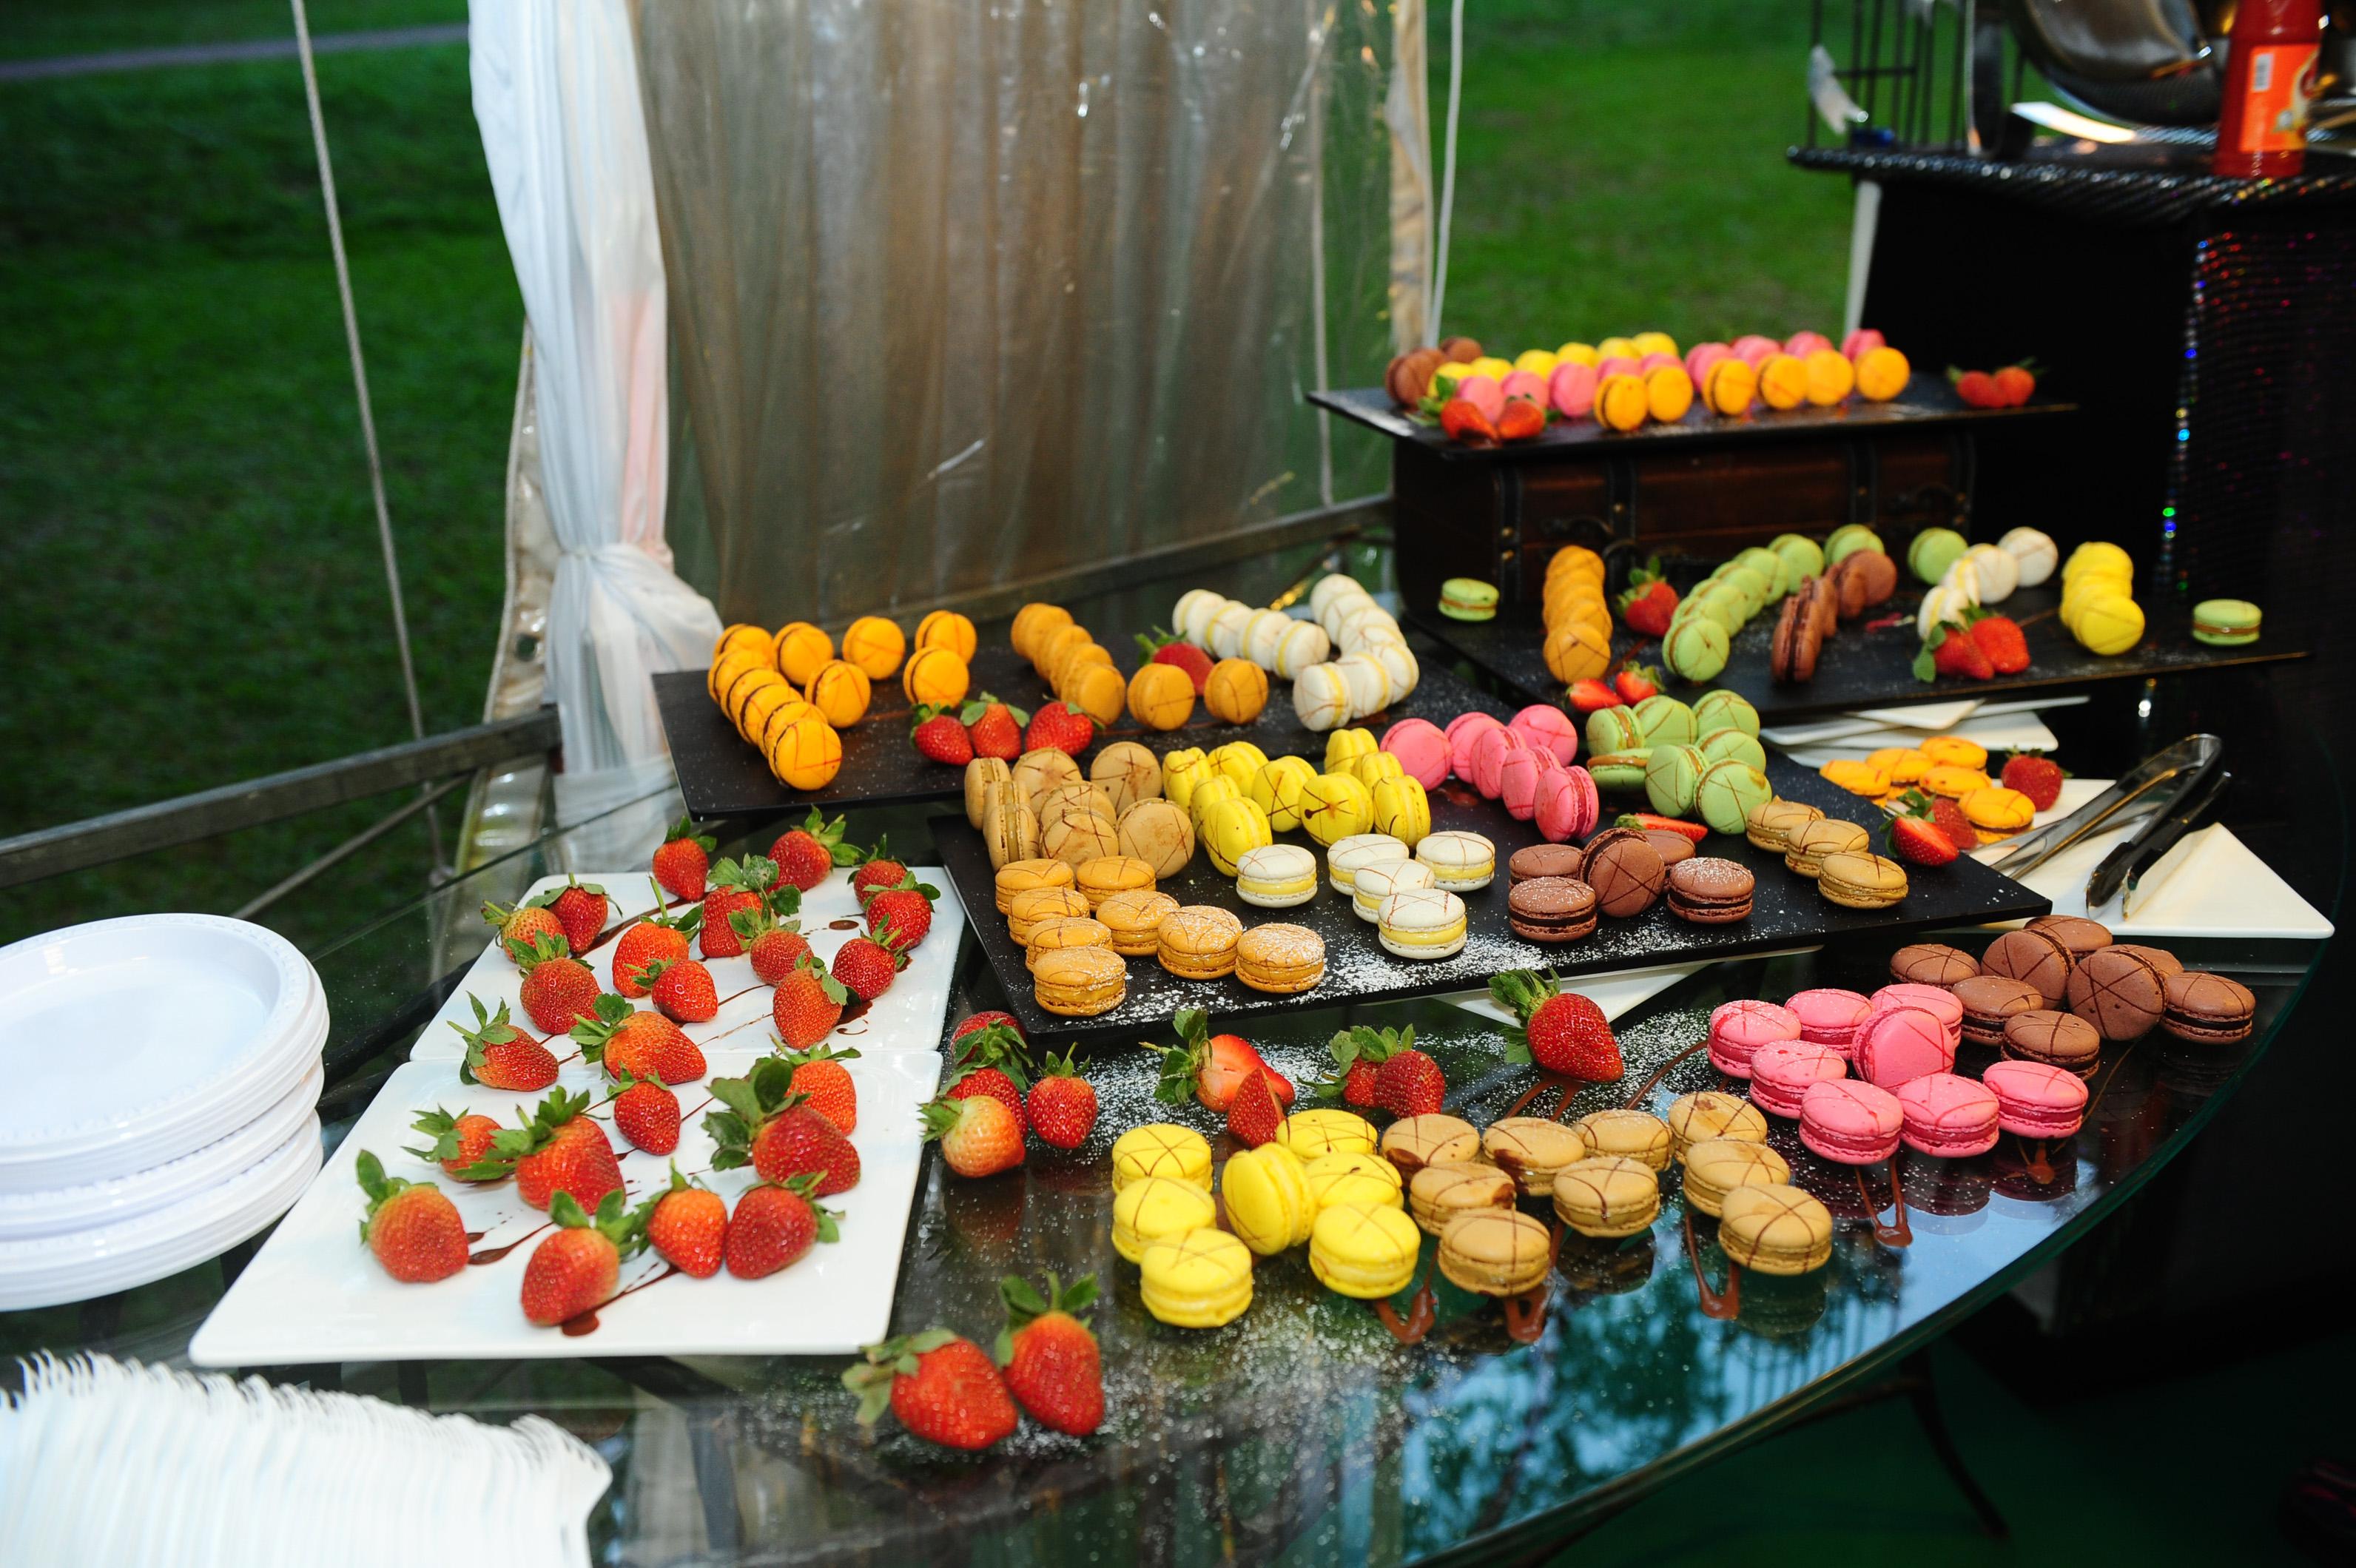 ohs farm catering wedding catering in singapore bridestorycom - Buffet Retro Cuisine